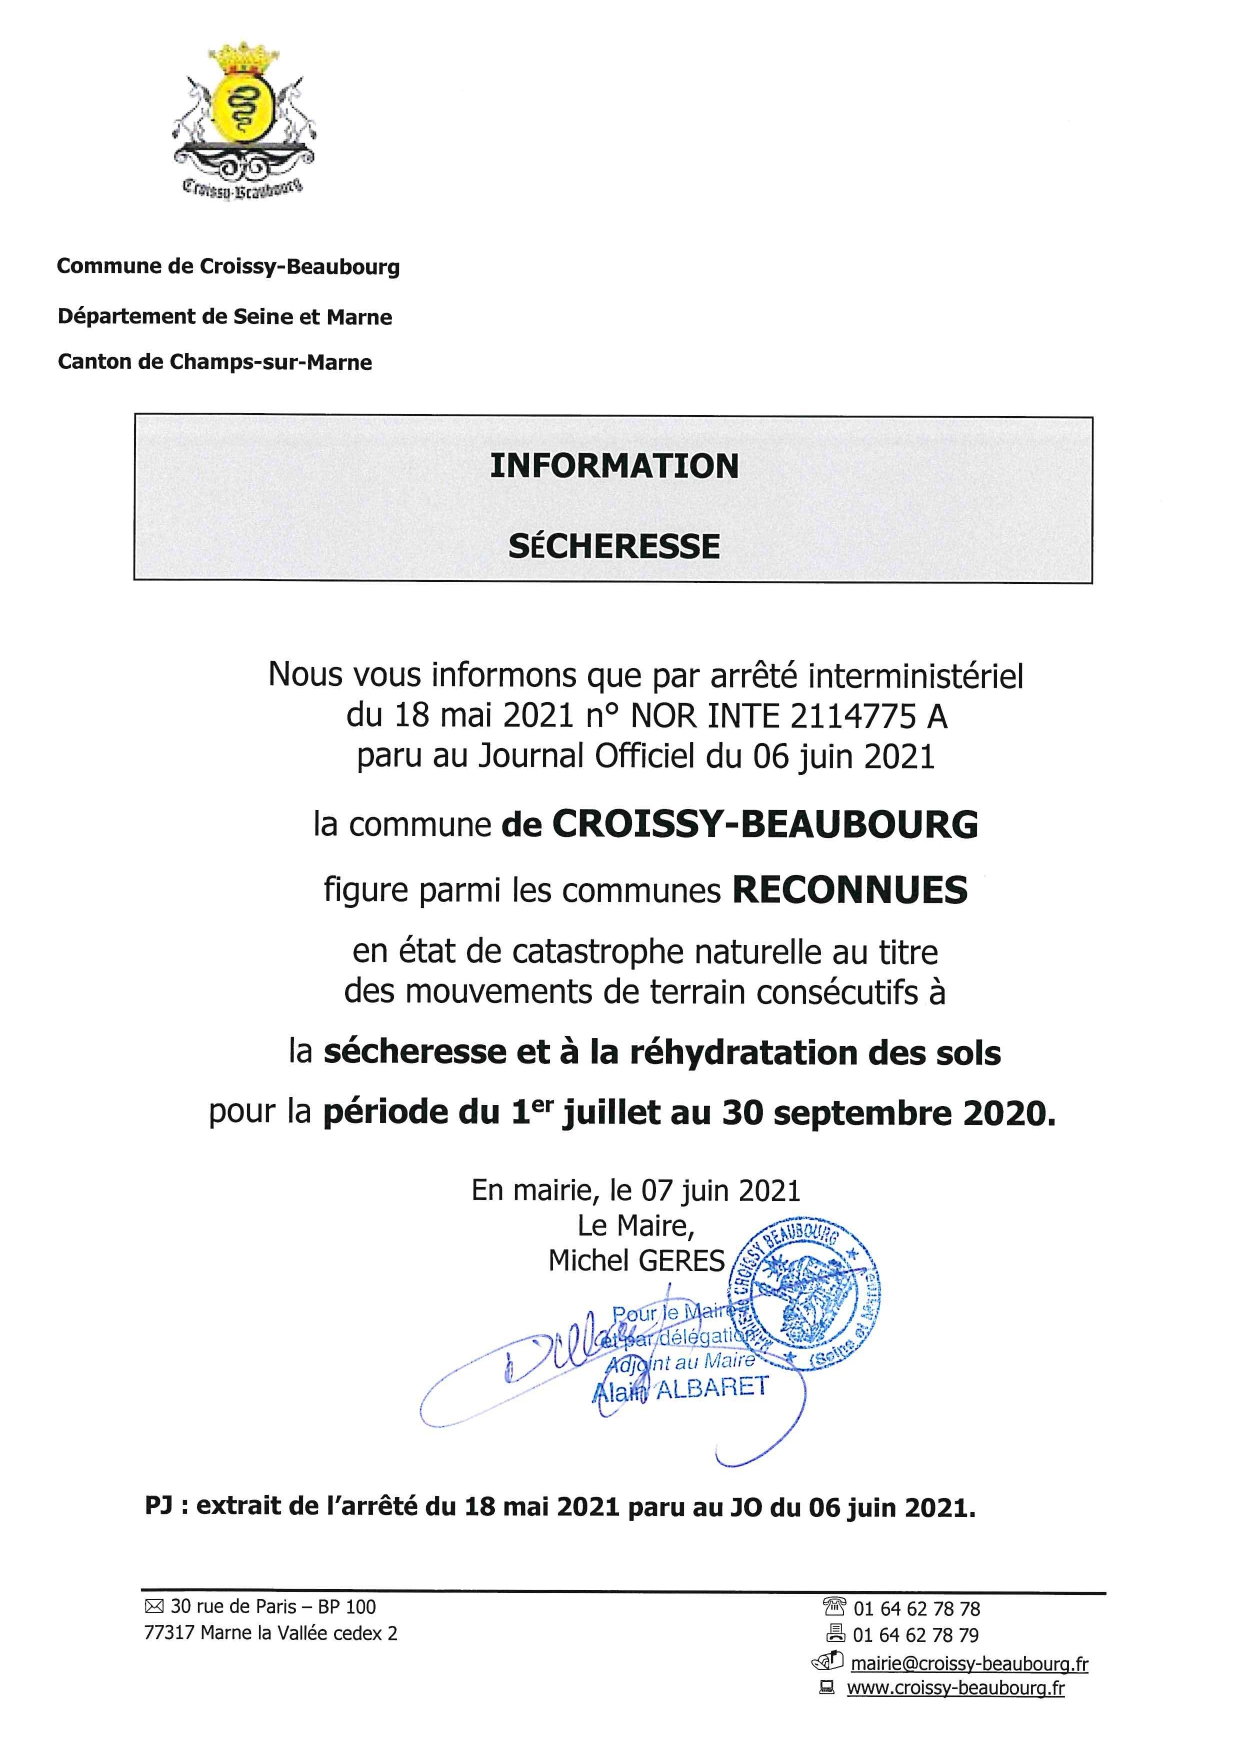 secheresse 01 07 au 20 09 2020 - affichage en mairie_page-0001.jpg